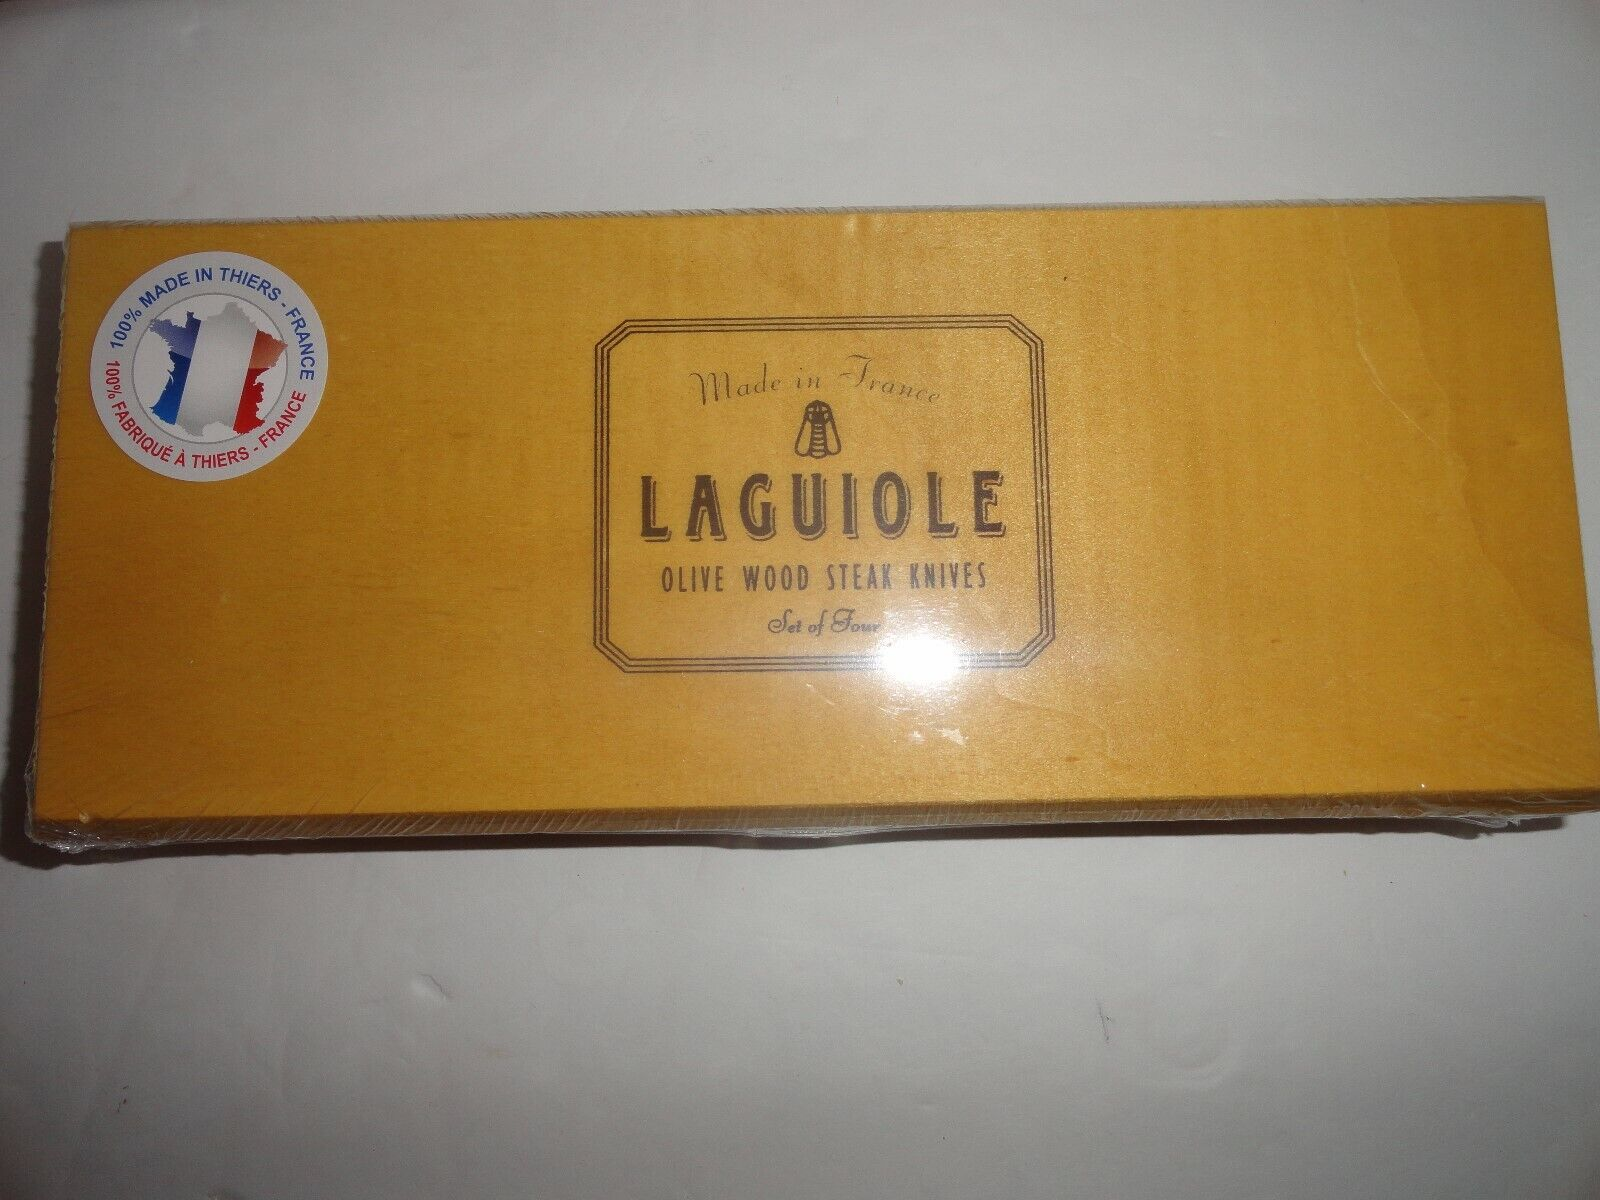 Laguiole Jean Dubost 4 piece Olive Wood Steak Knife Set with Presentation Box